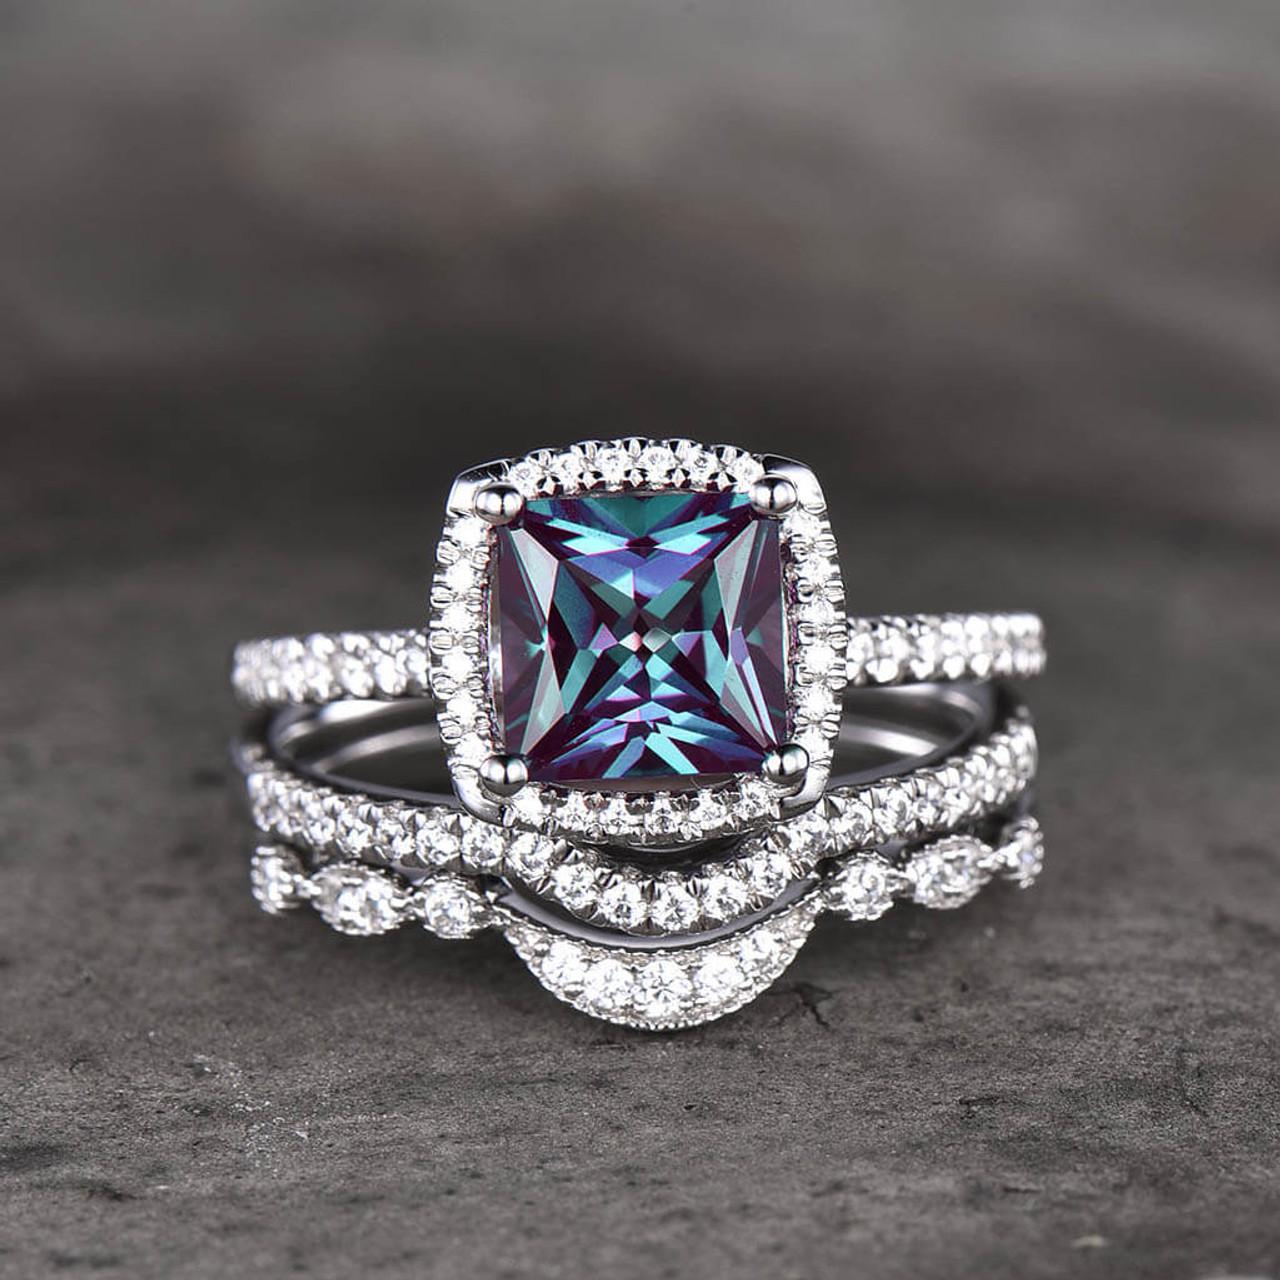 3pcs Princess Cut Alexandrite And Diamond Engagement Ring Set Basket Prong Set